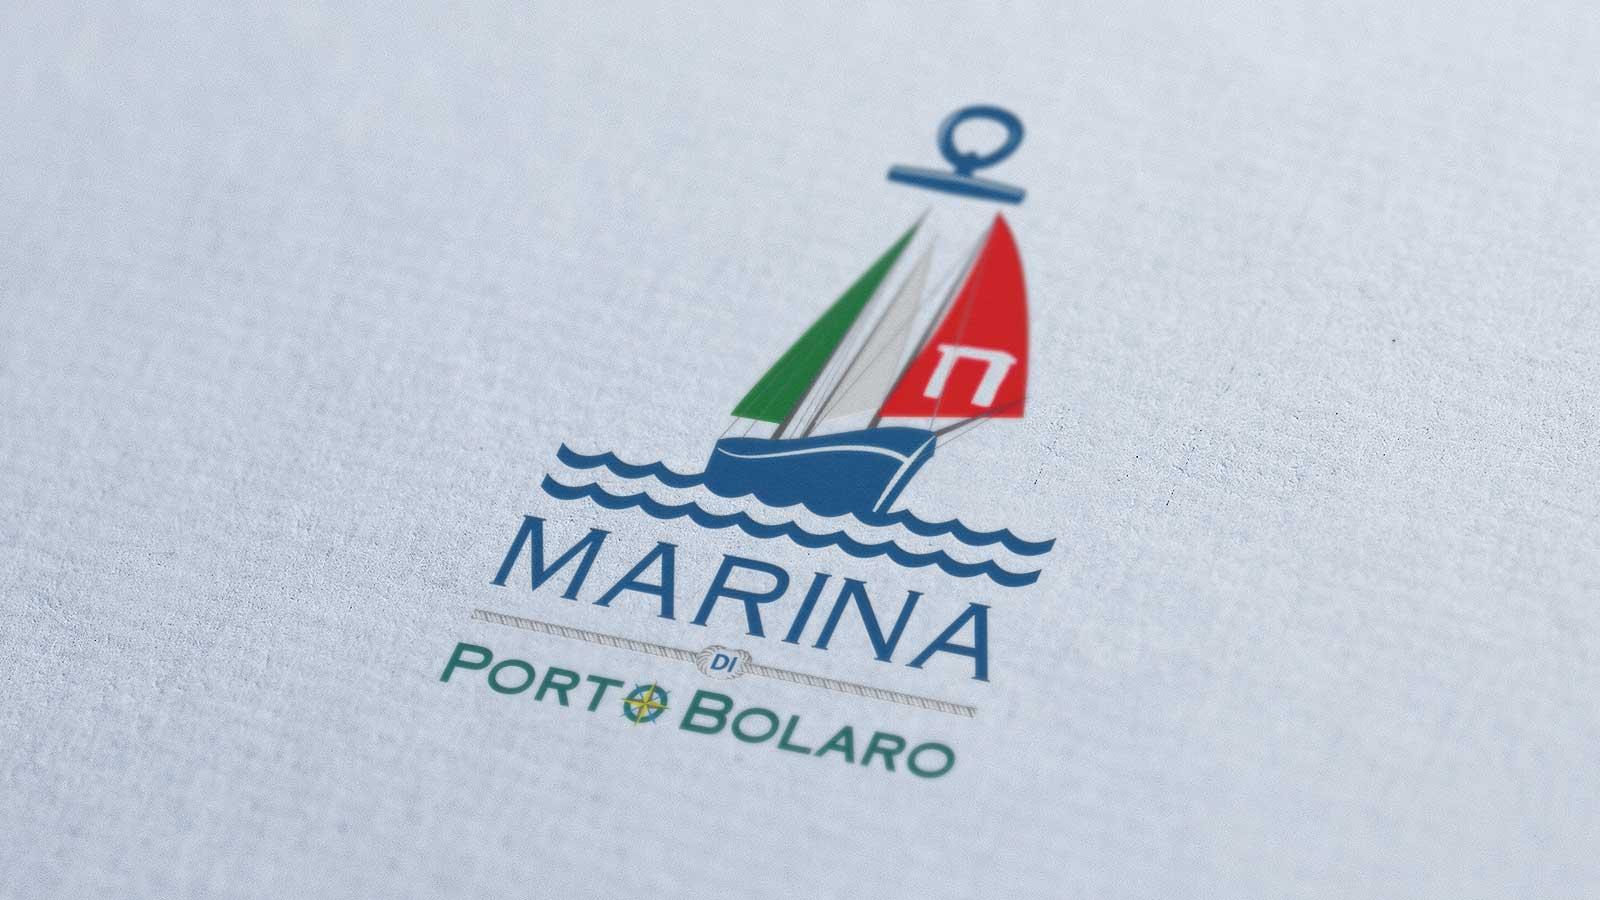 bisestyle-mediterraneo-MARINA-DI-PORTO-BOLARO-slider2